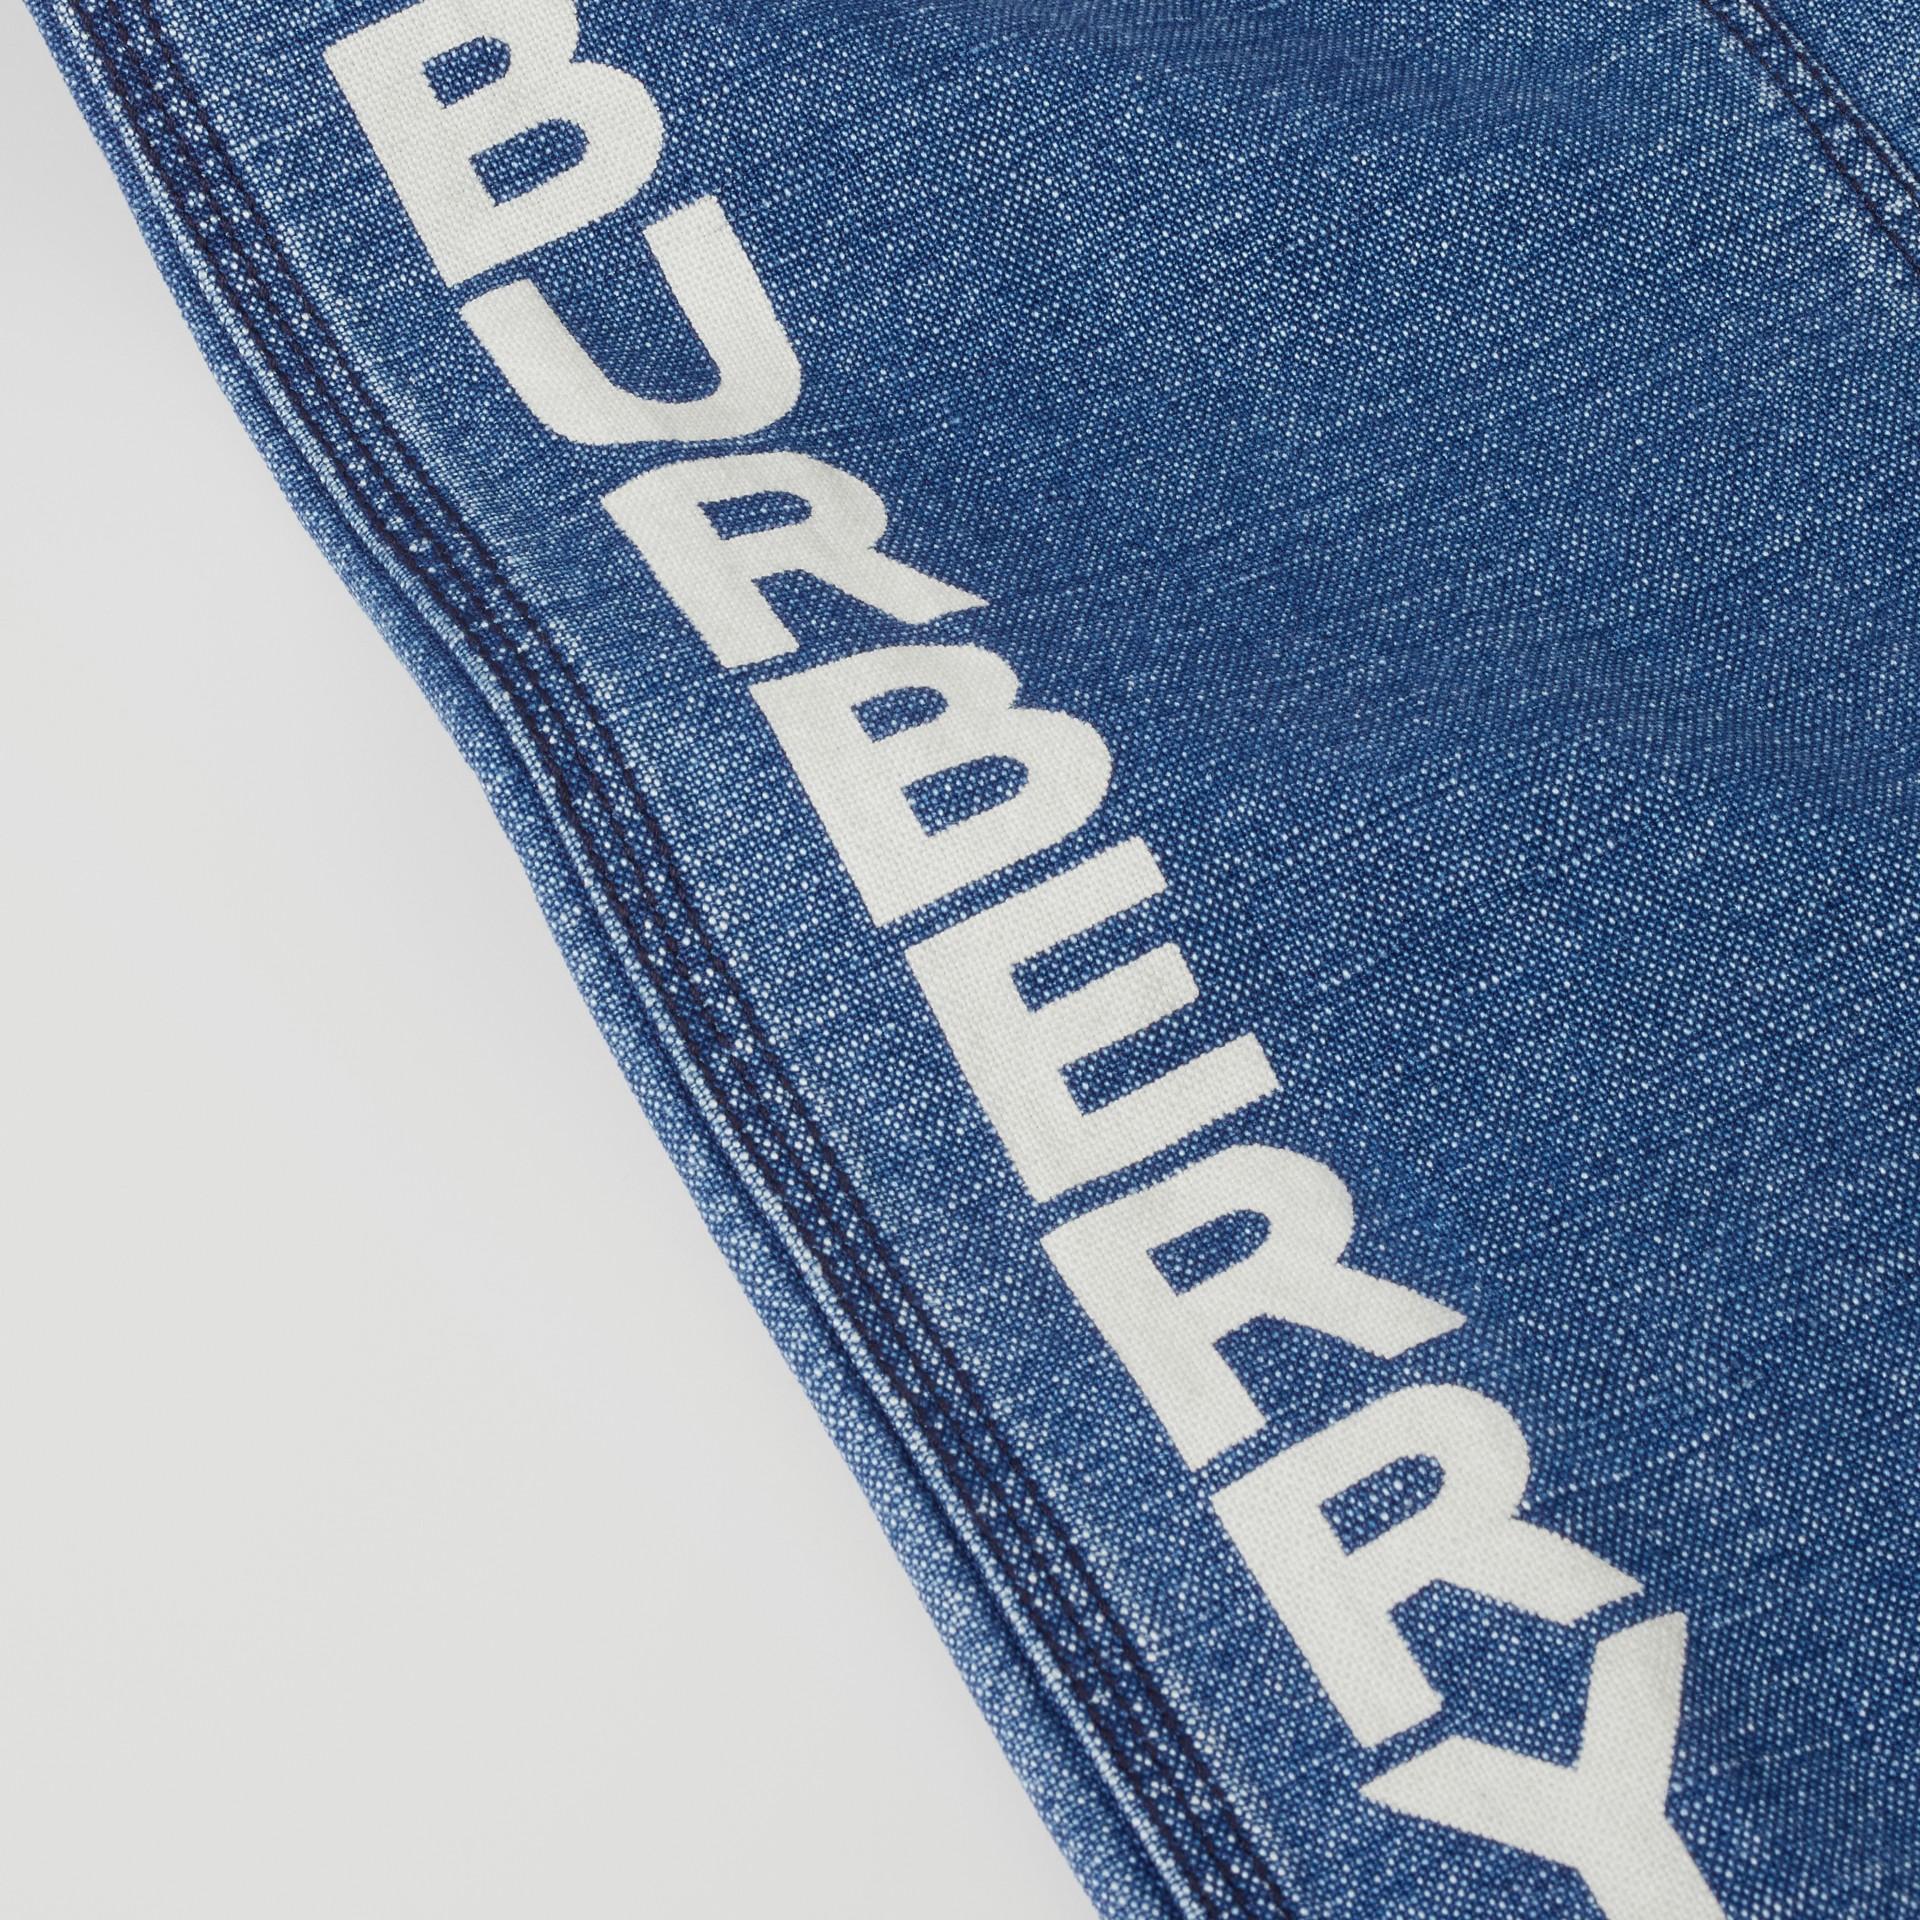 Logo Print Japanese Denim Jeans in Indigo - Girl   Burberry - gallery image 1